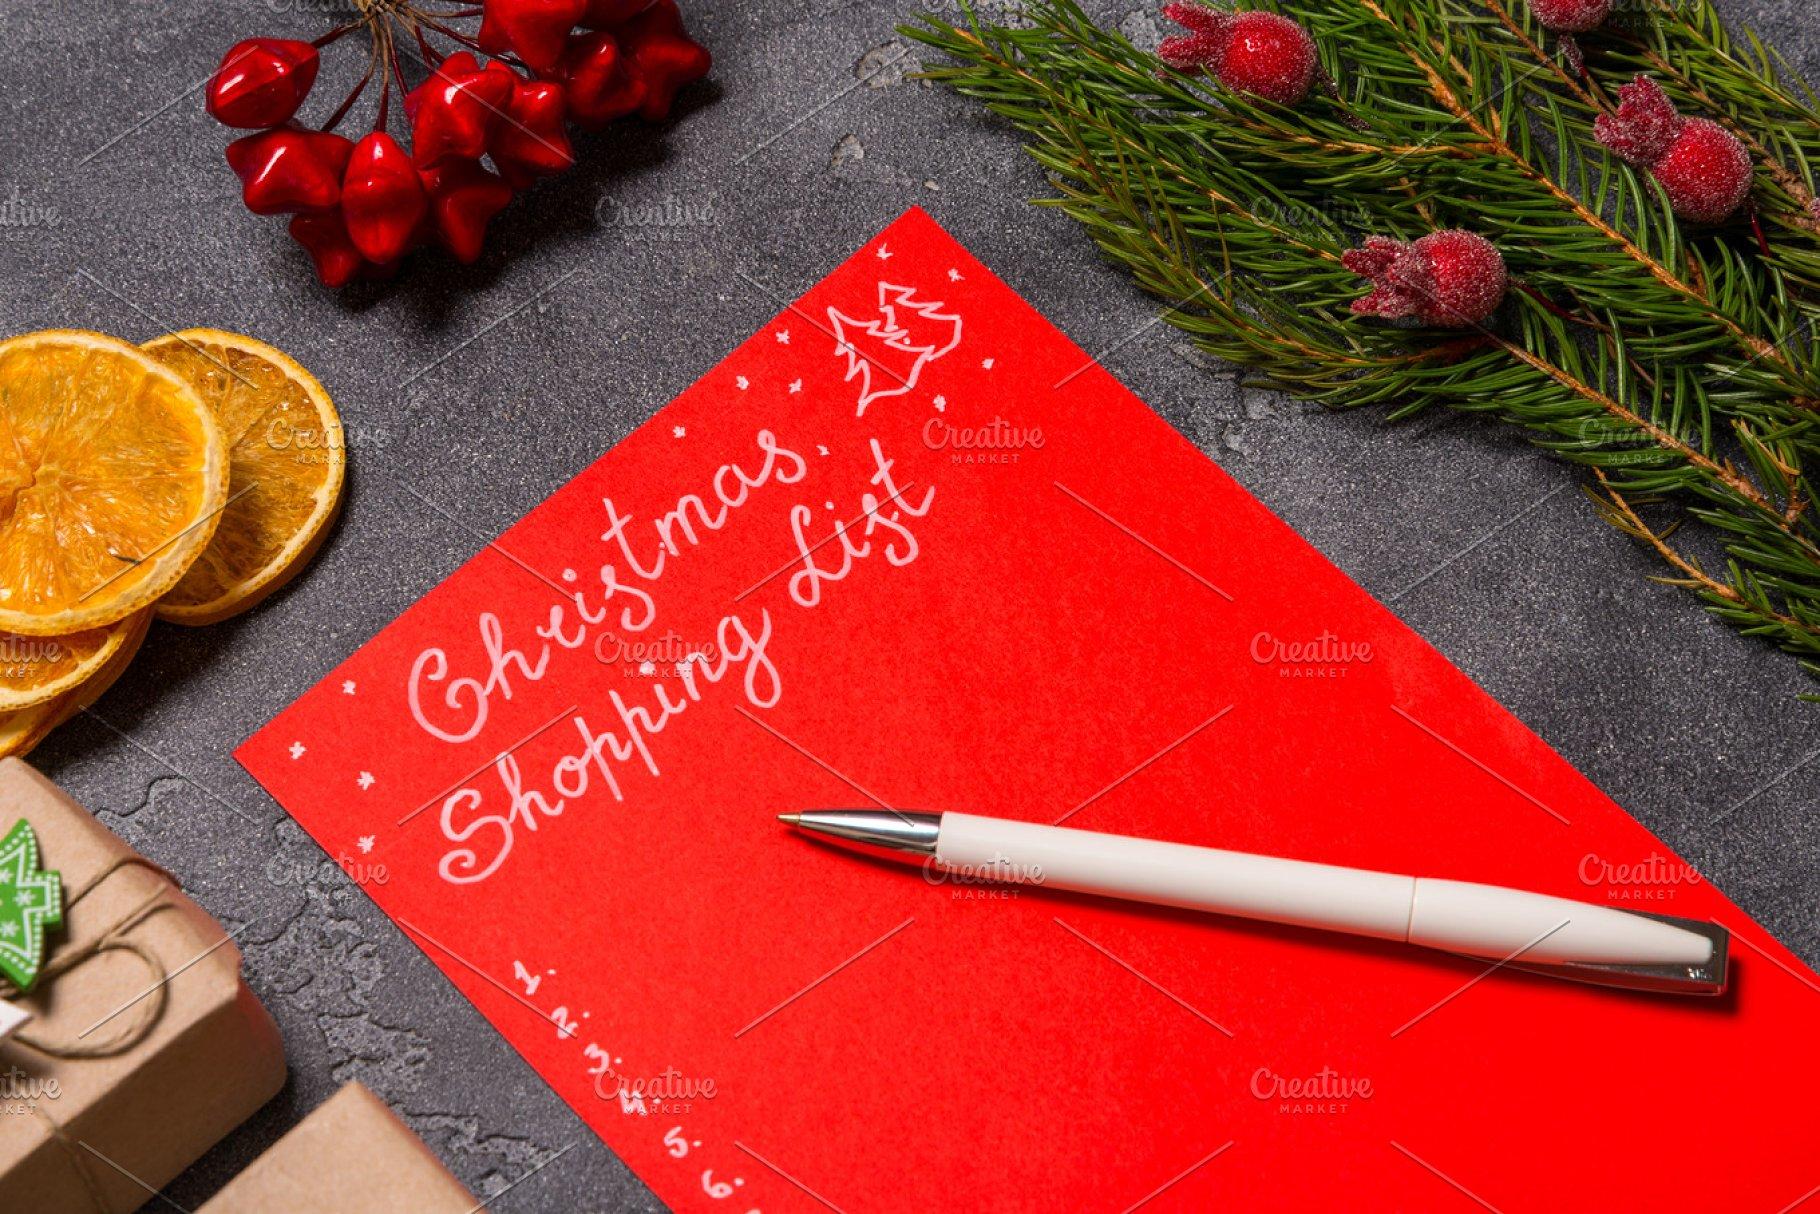 Christmas Shopping List Holiday Photos Creative Market